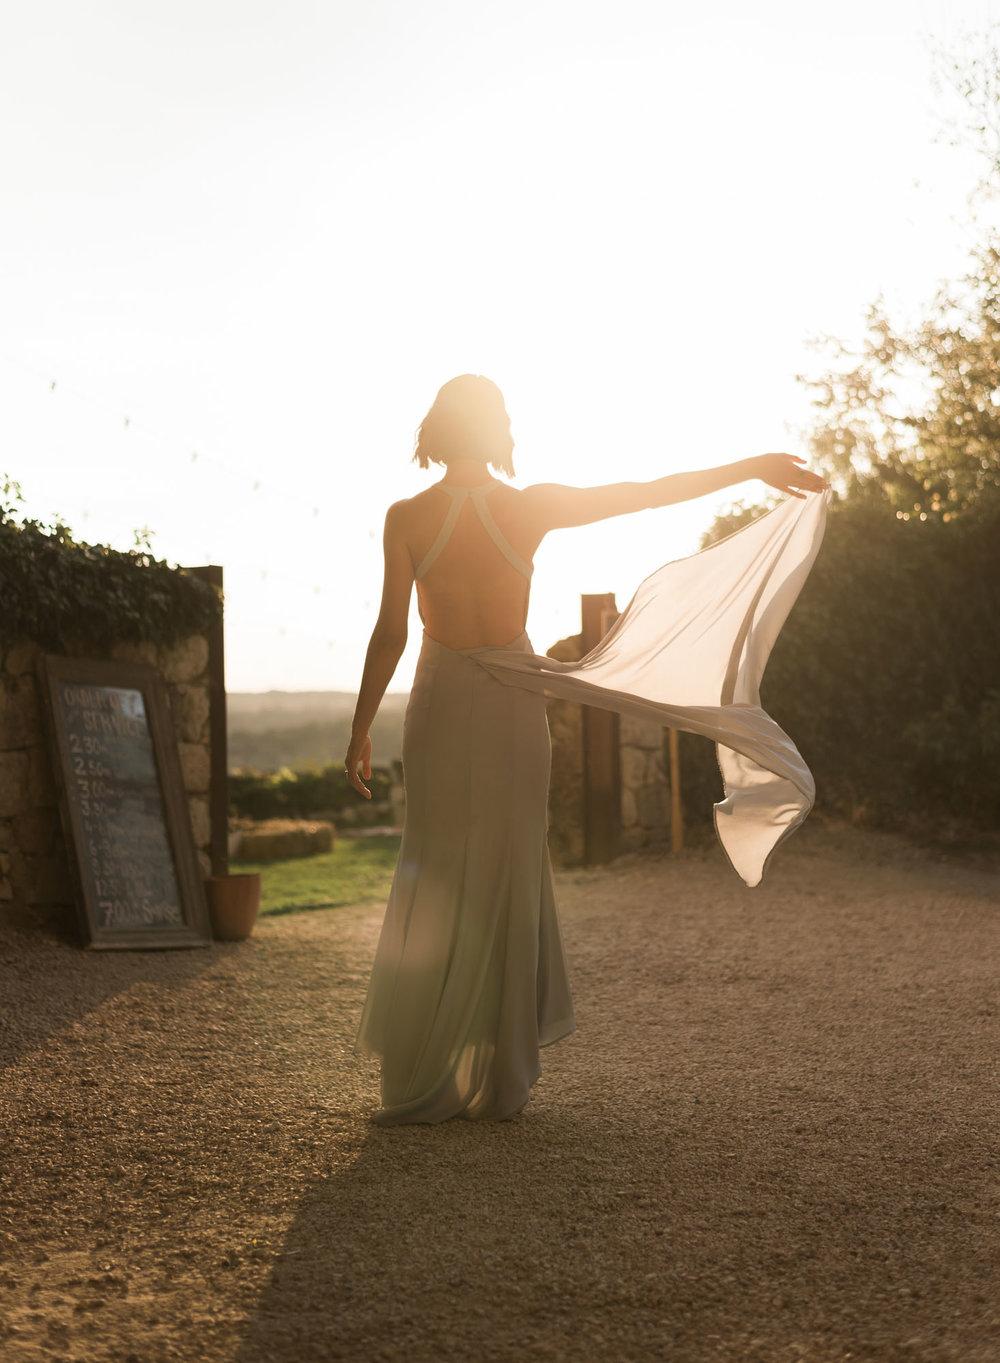 gascony_french_wedding-71.jpg